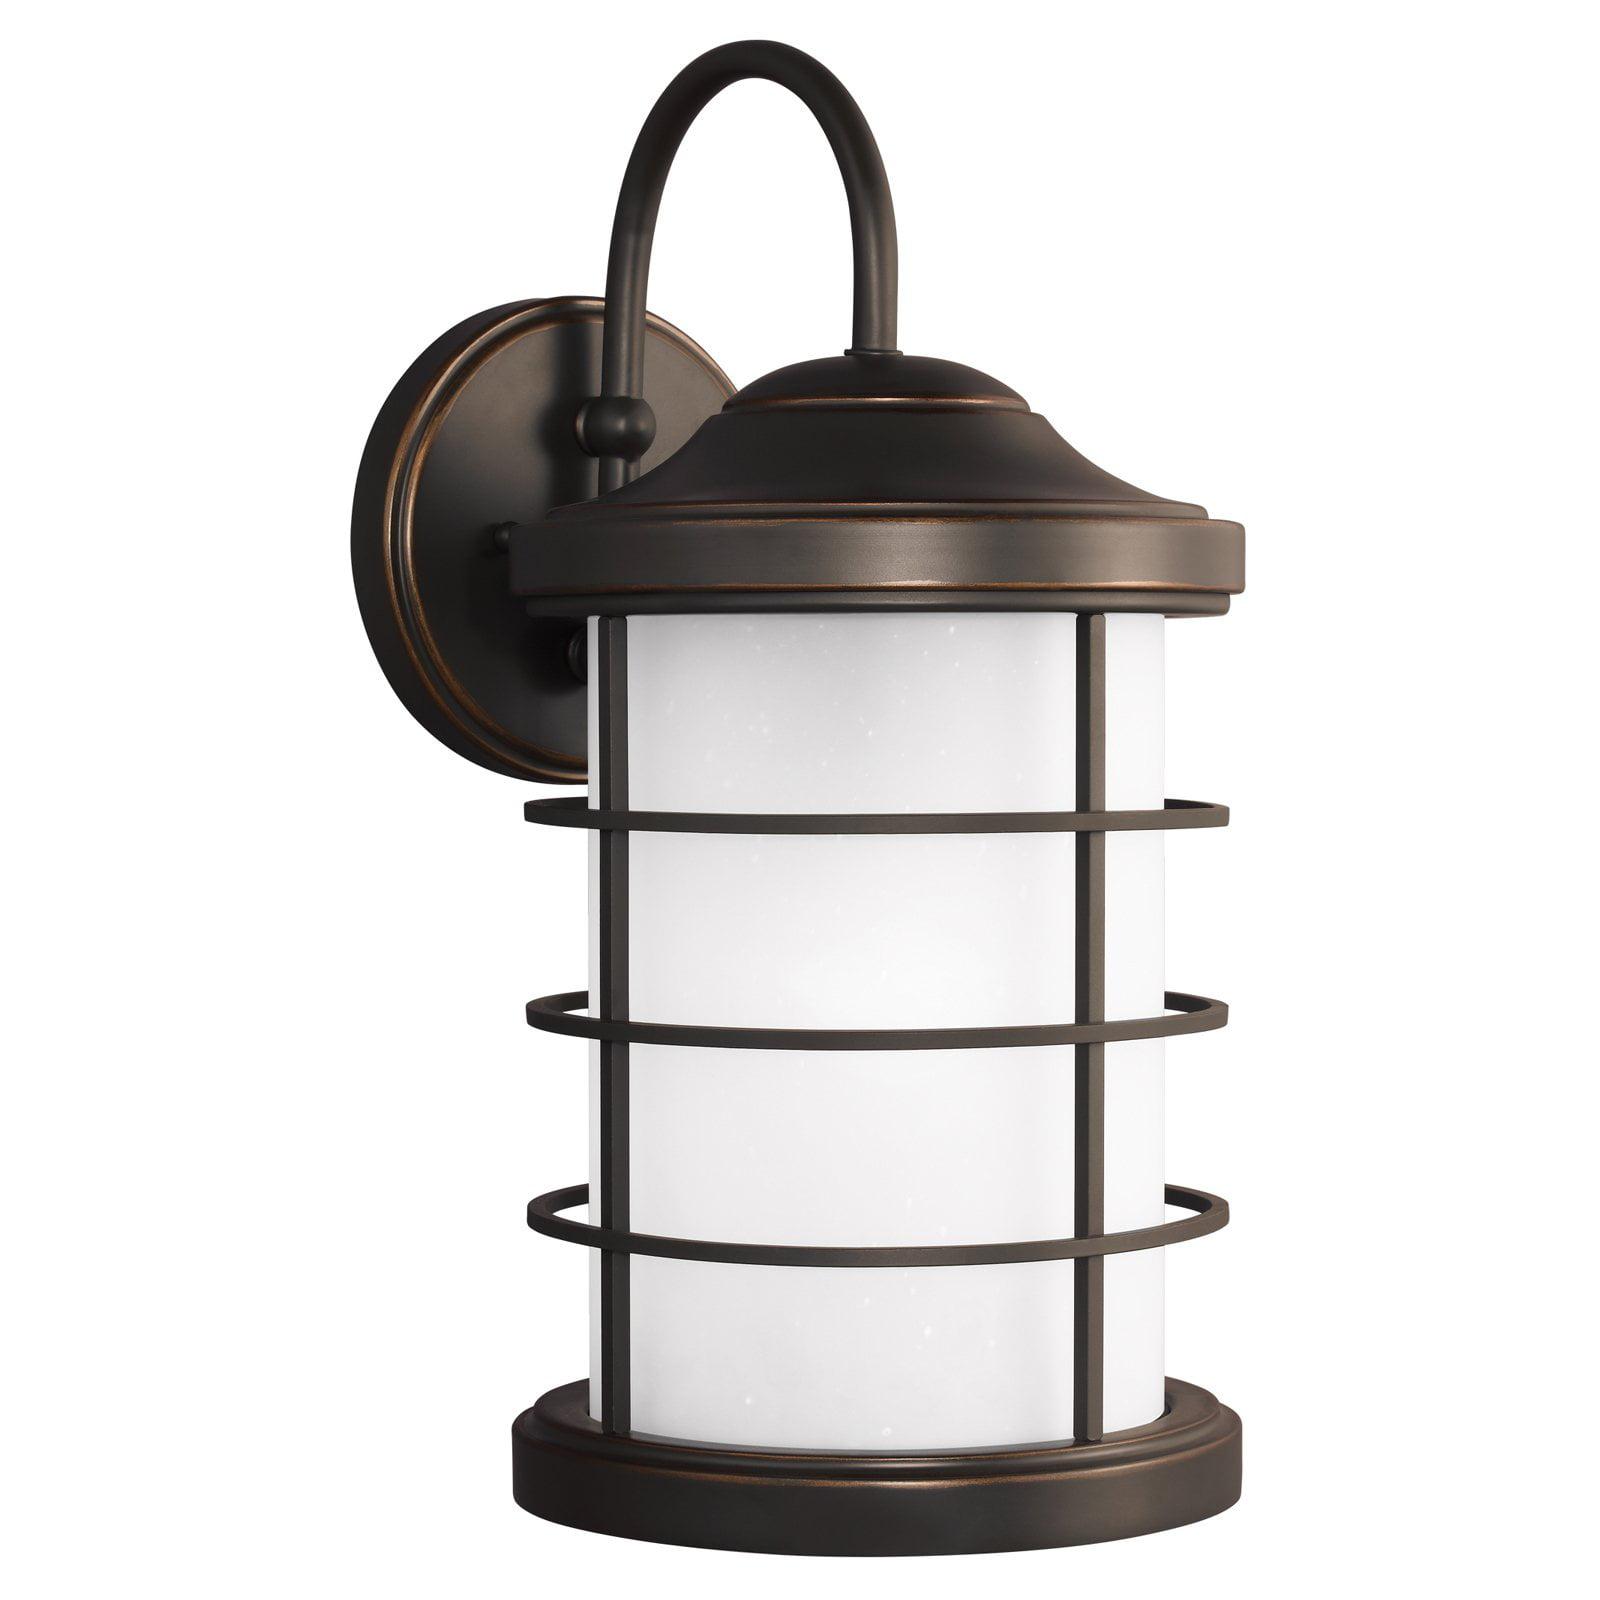 Sea Gull Lighting Sauganash 8624451 Outdoor Wall Lantern